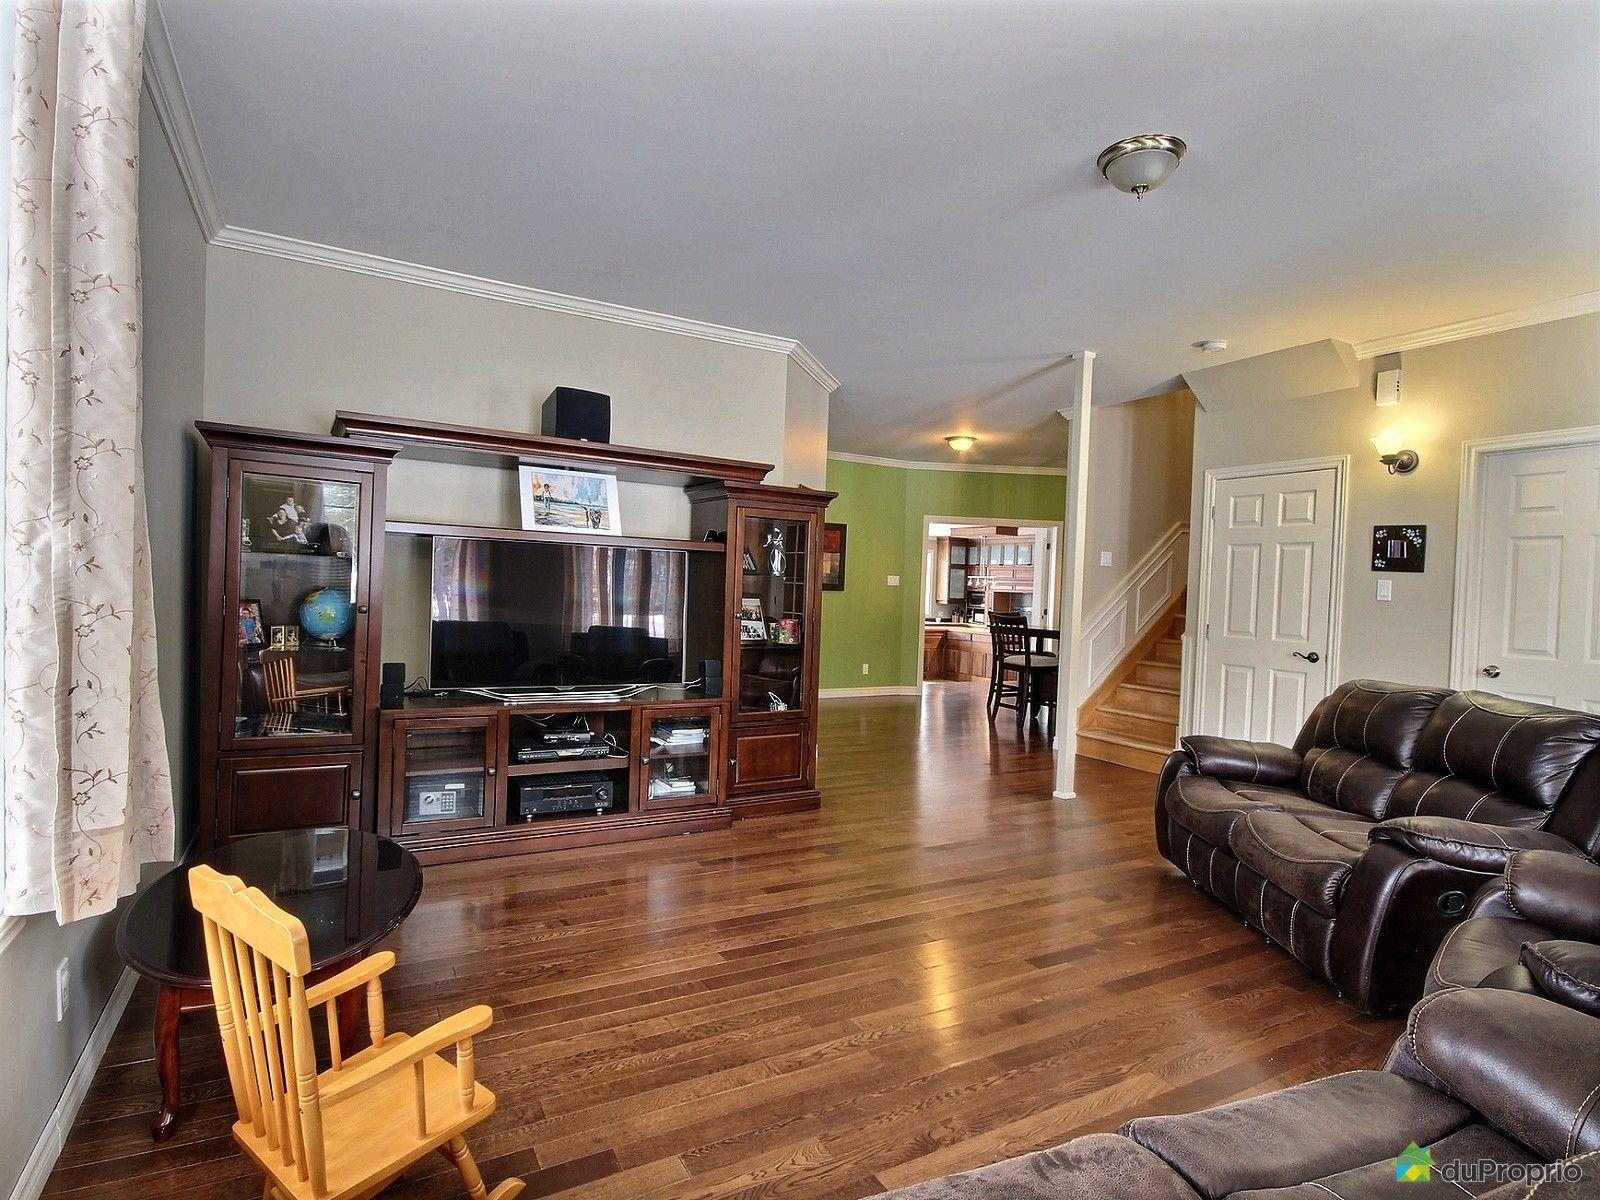 bi g n ration vendre ste m lanie 30 rue de l 39 harmonie immobilier qu bec duproprio 679717. Black Bedroom Furniture Sets. Home Design Ideas